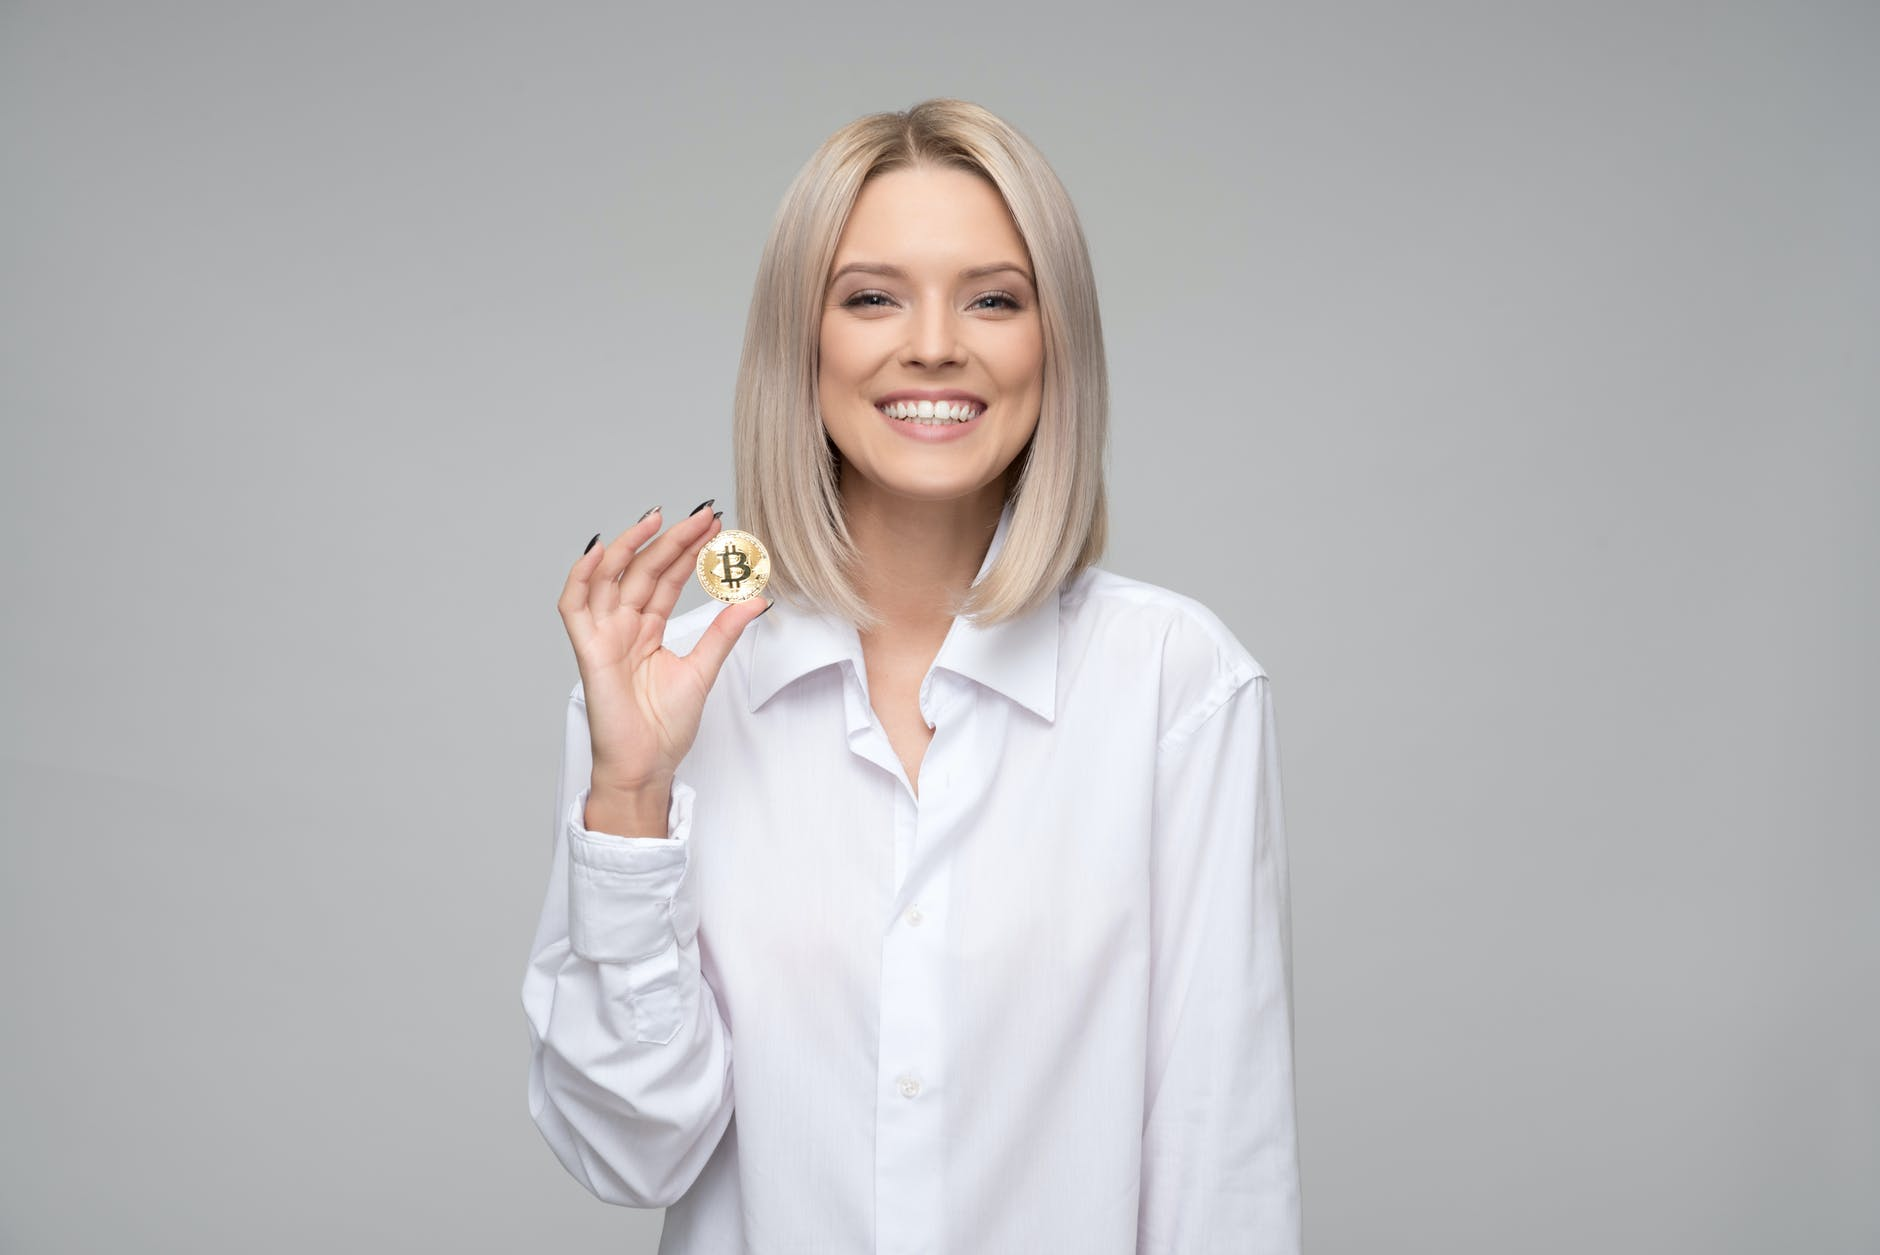 Bitcoin piaci kapitalizációja | CryptoFalka